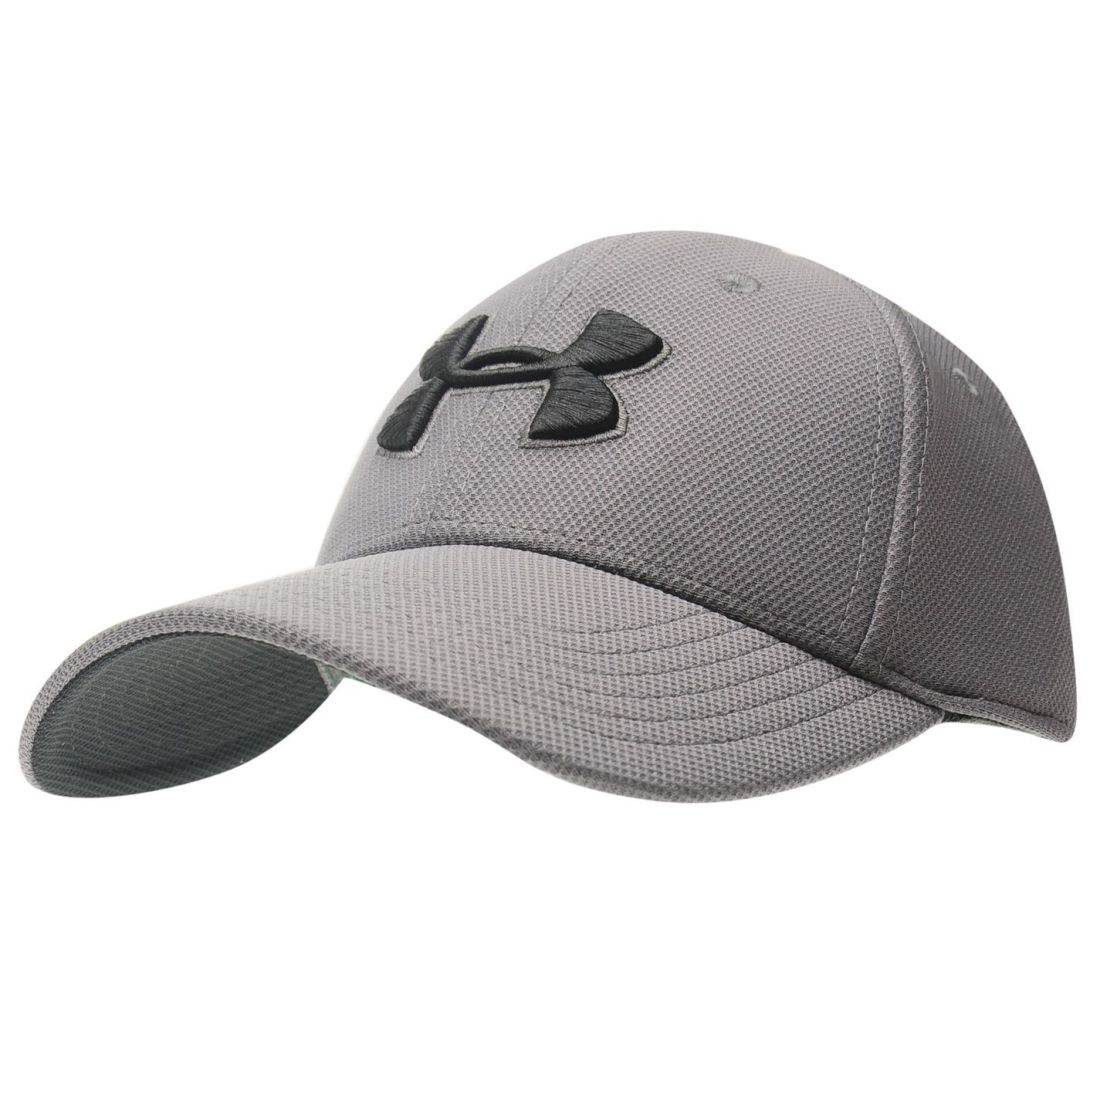 ffe426adaa Details about Mens Under Armour Blitzing 3.0 Cap Baseball Tonal Stitching  New